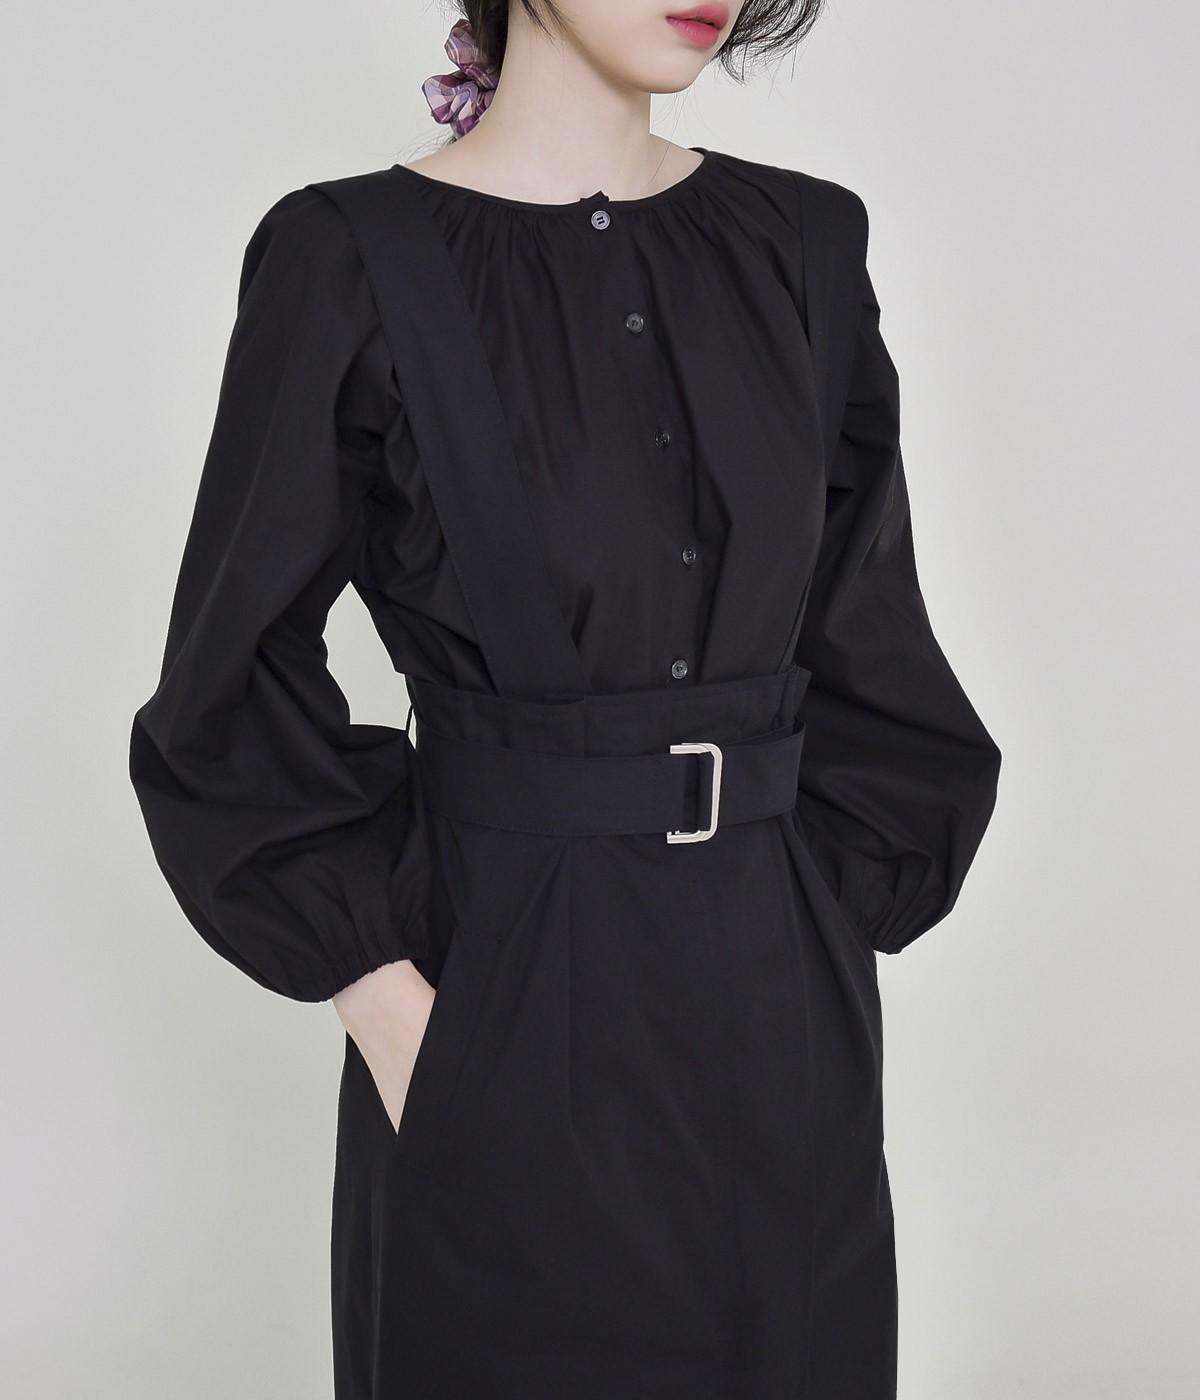 Bonin shirred blouse